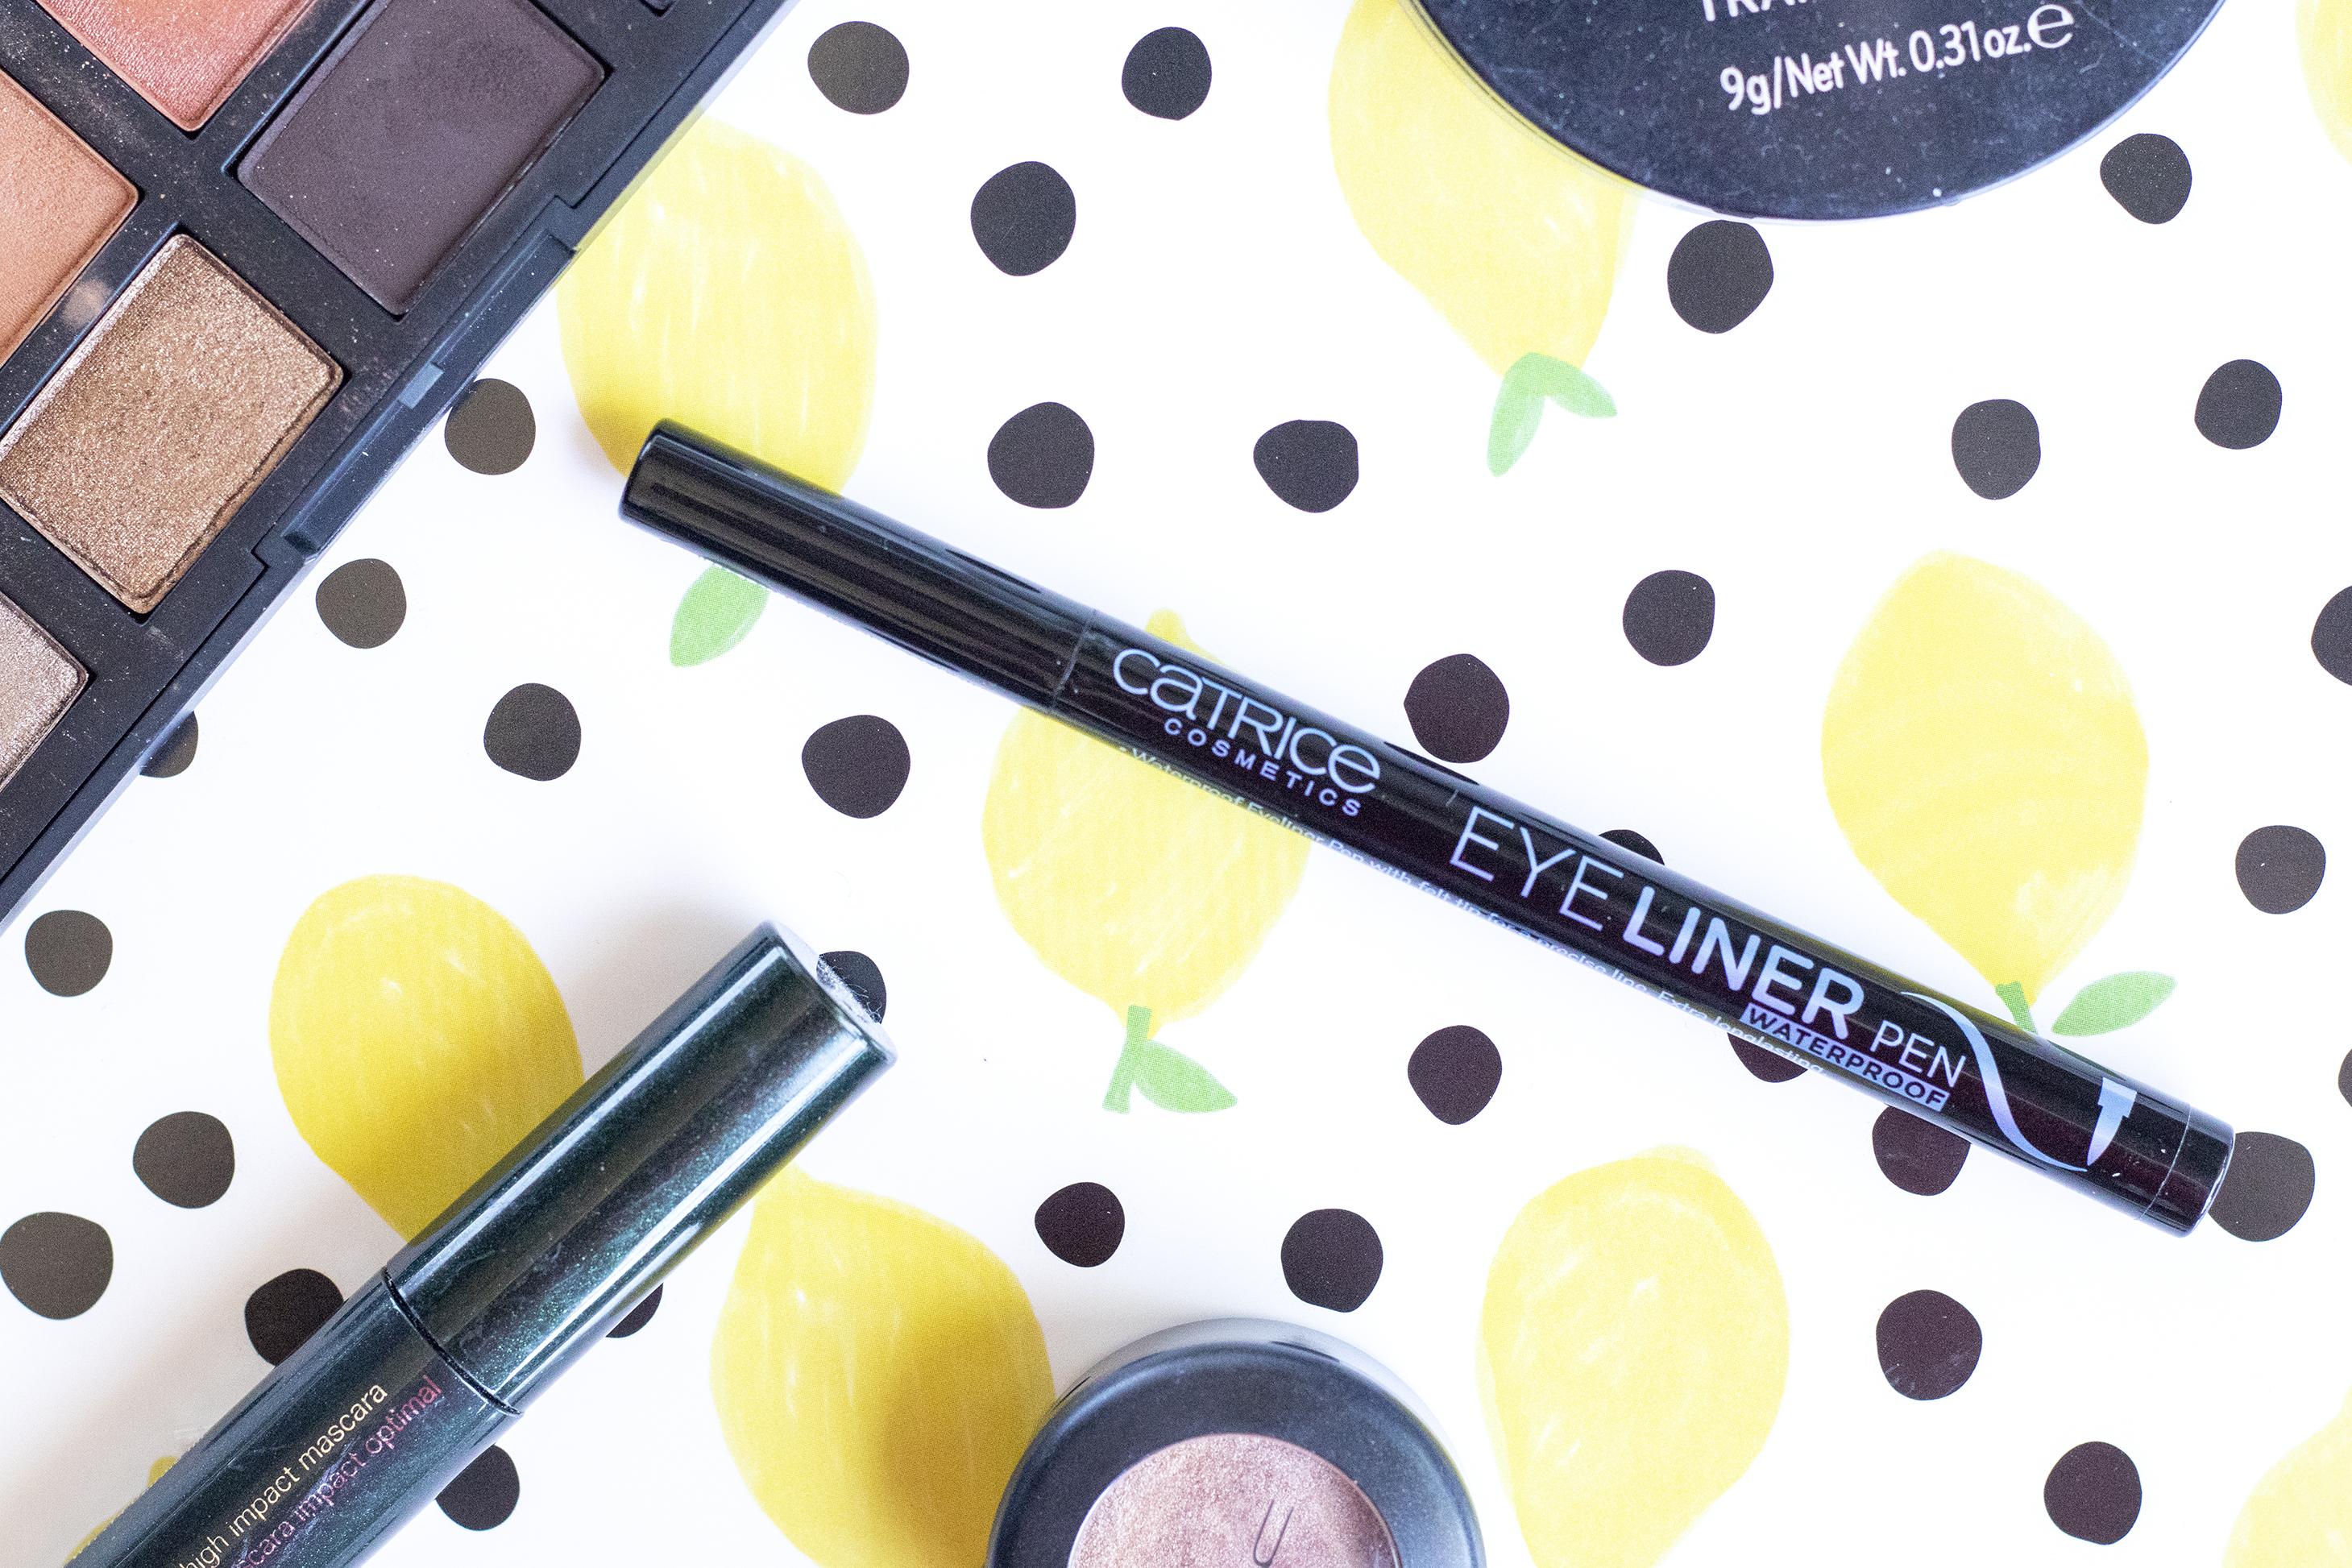 catrice eyeliner pen waterproof review